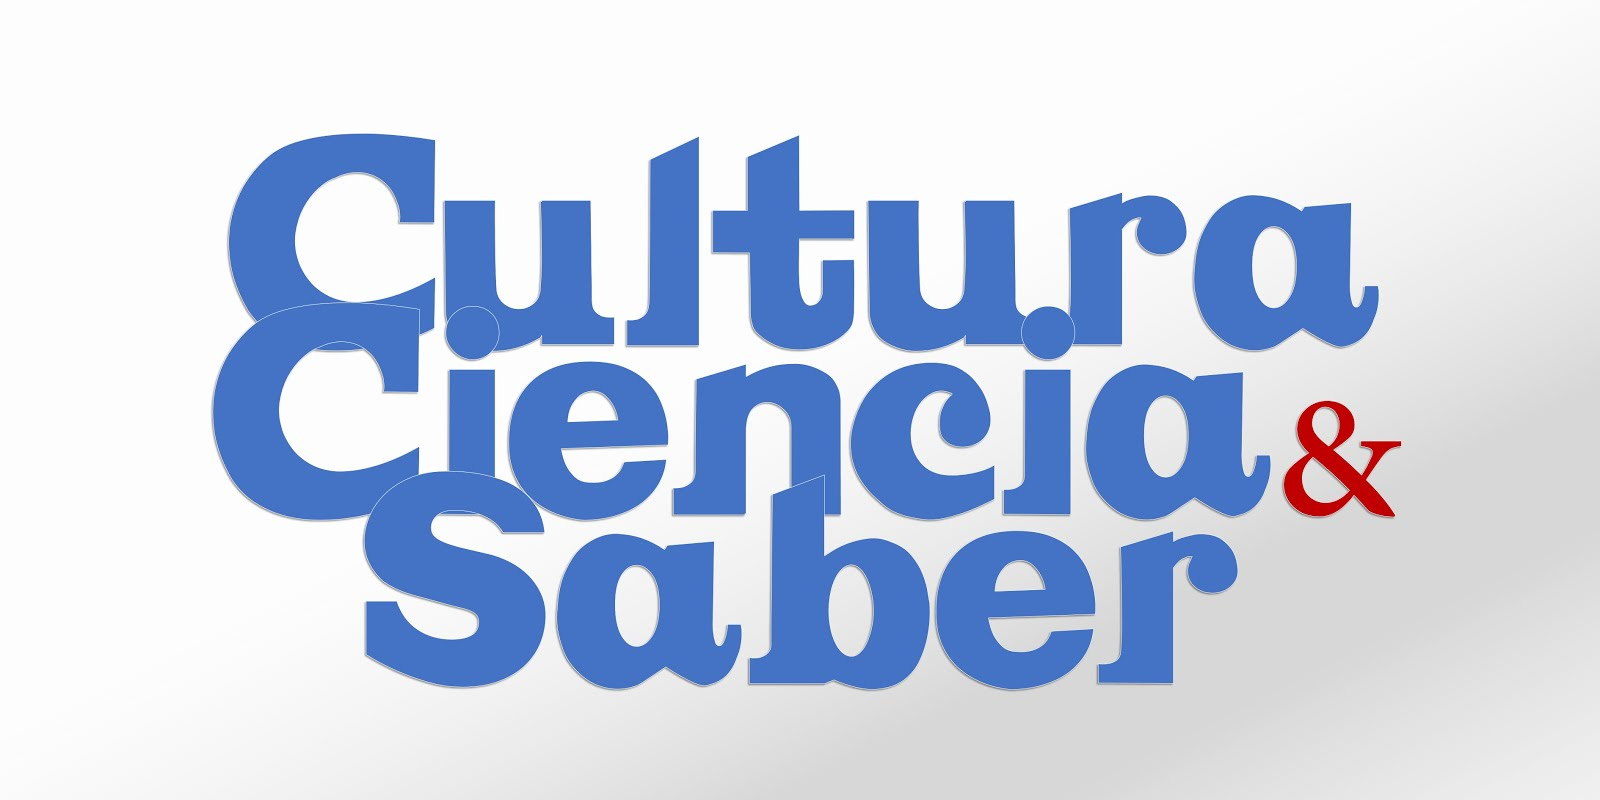 CULTURA CIENCIA & SABER